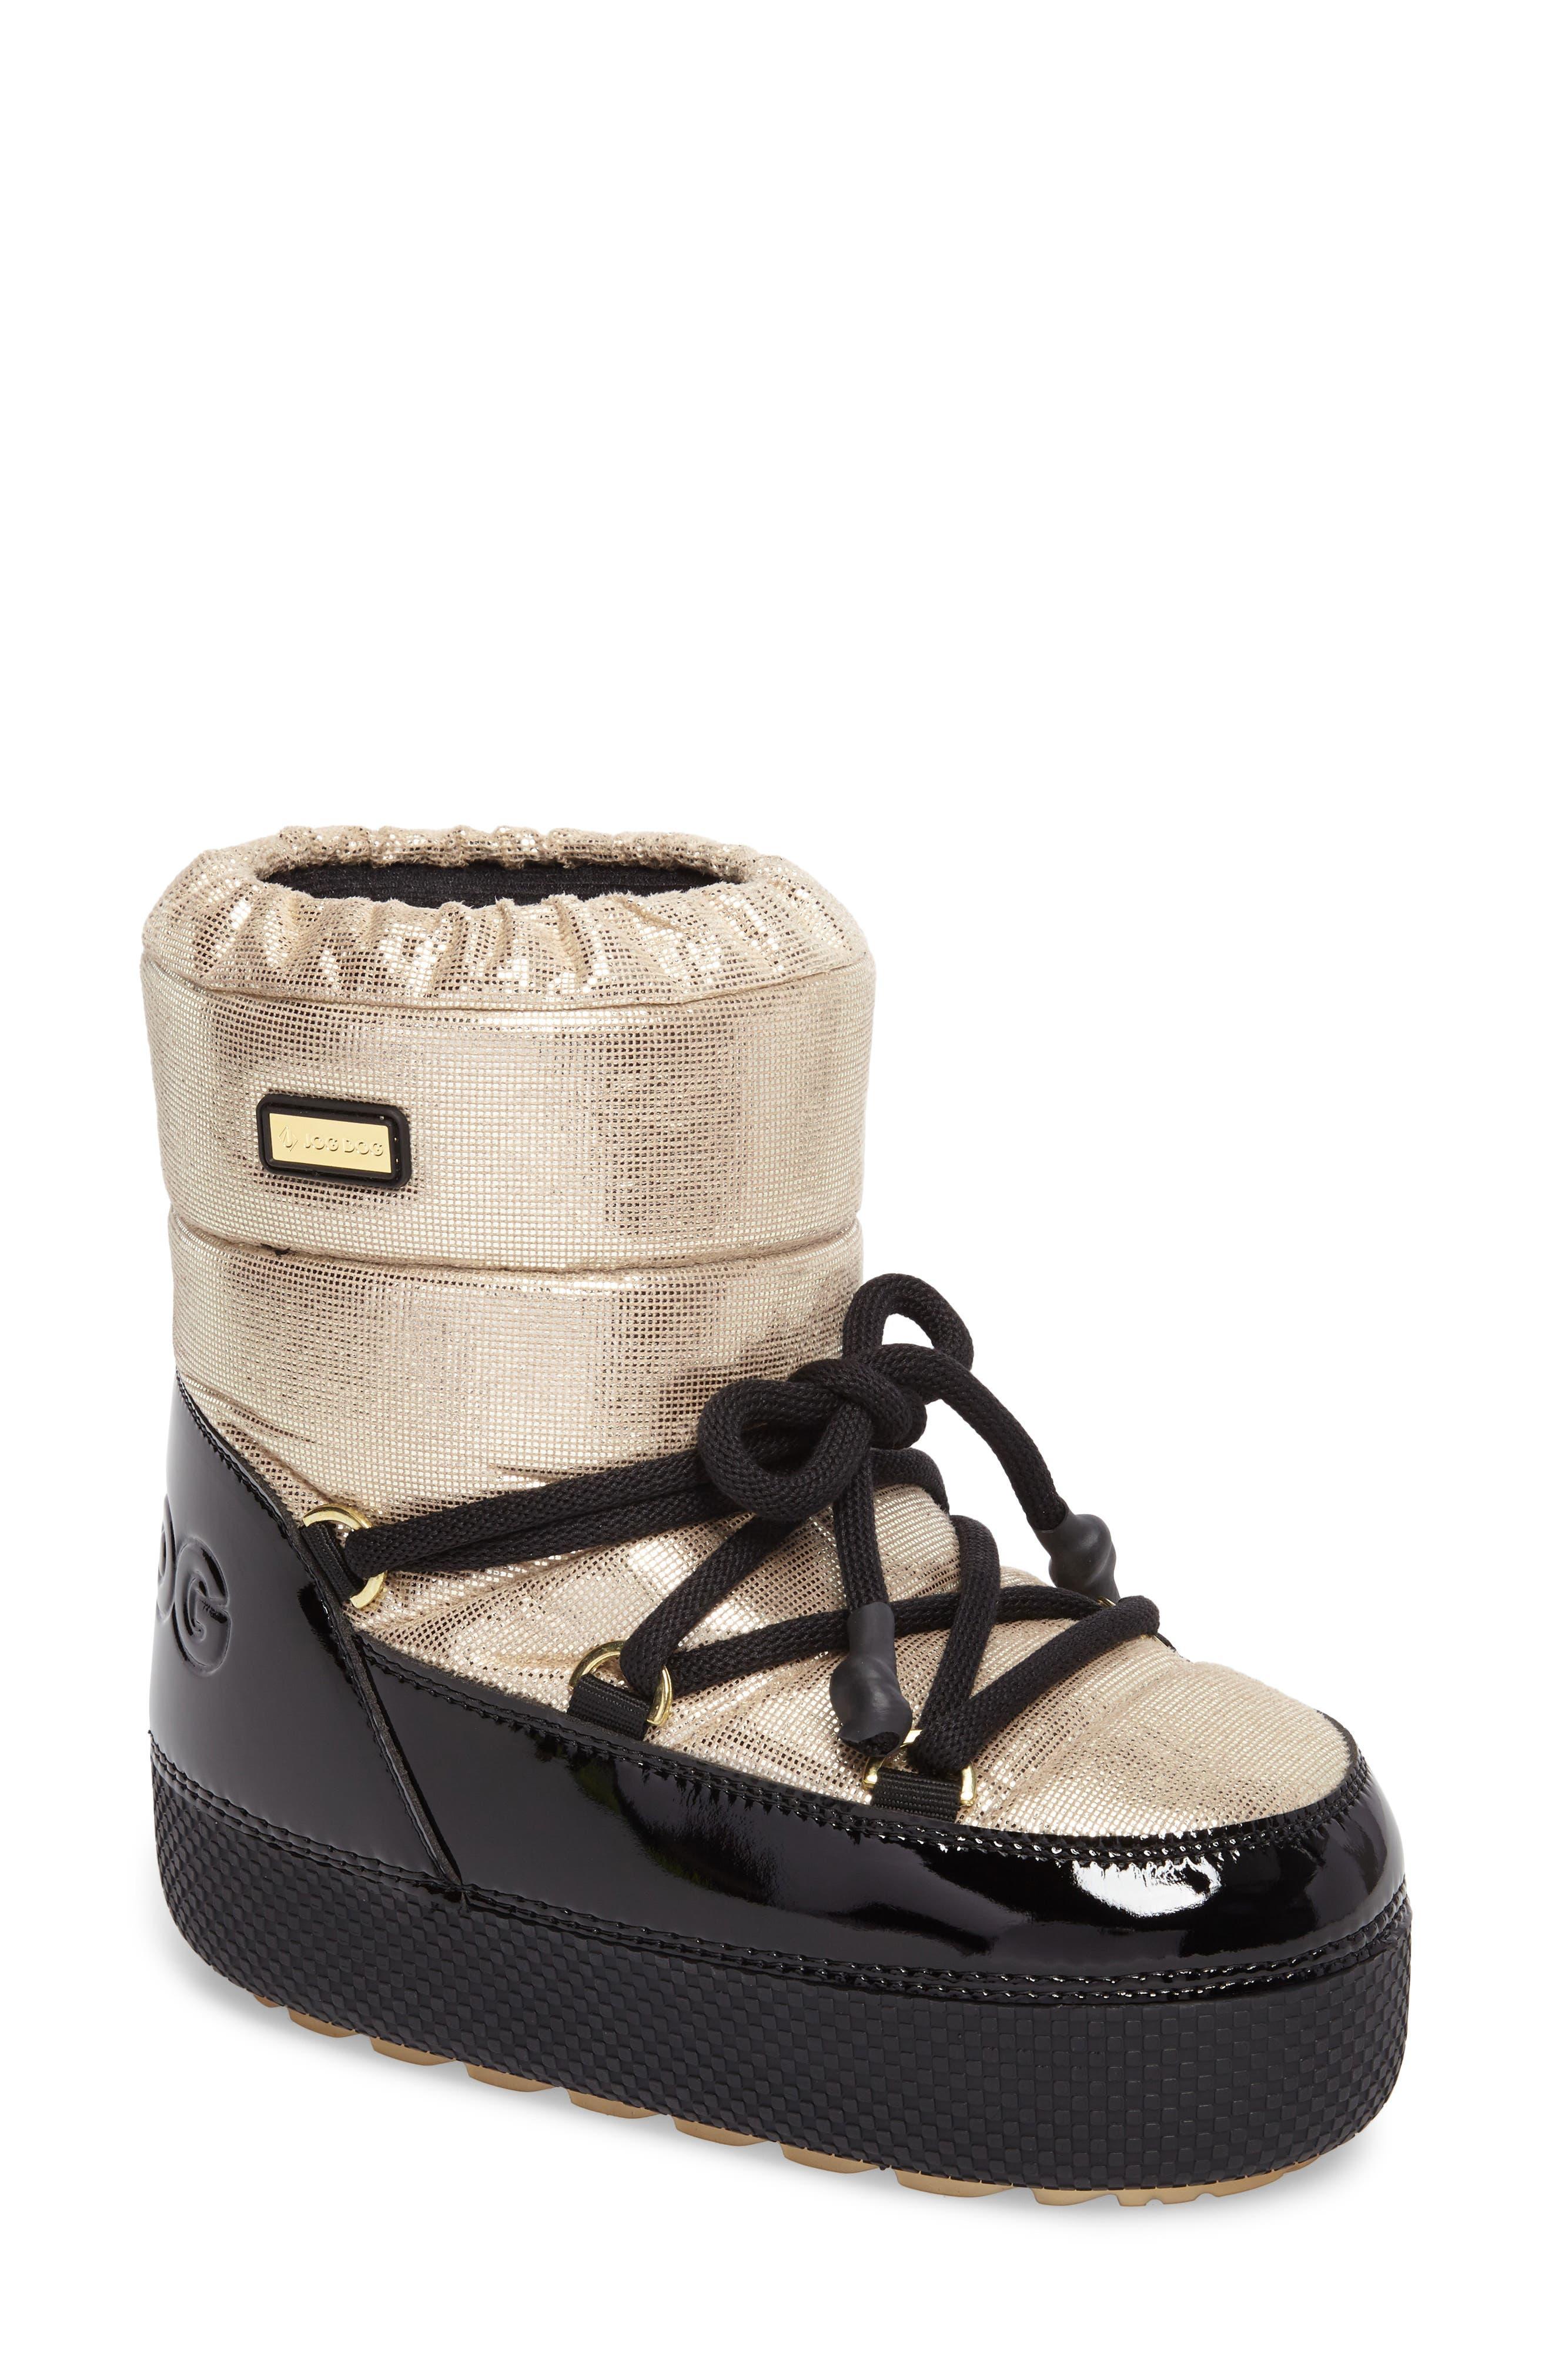 Alternate Image 1 Selected - JOG DOG Gstaad Waterproof Boot (Women)